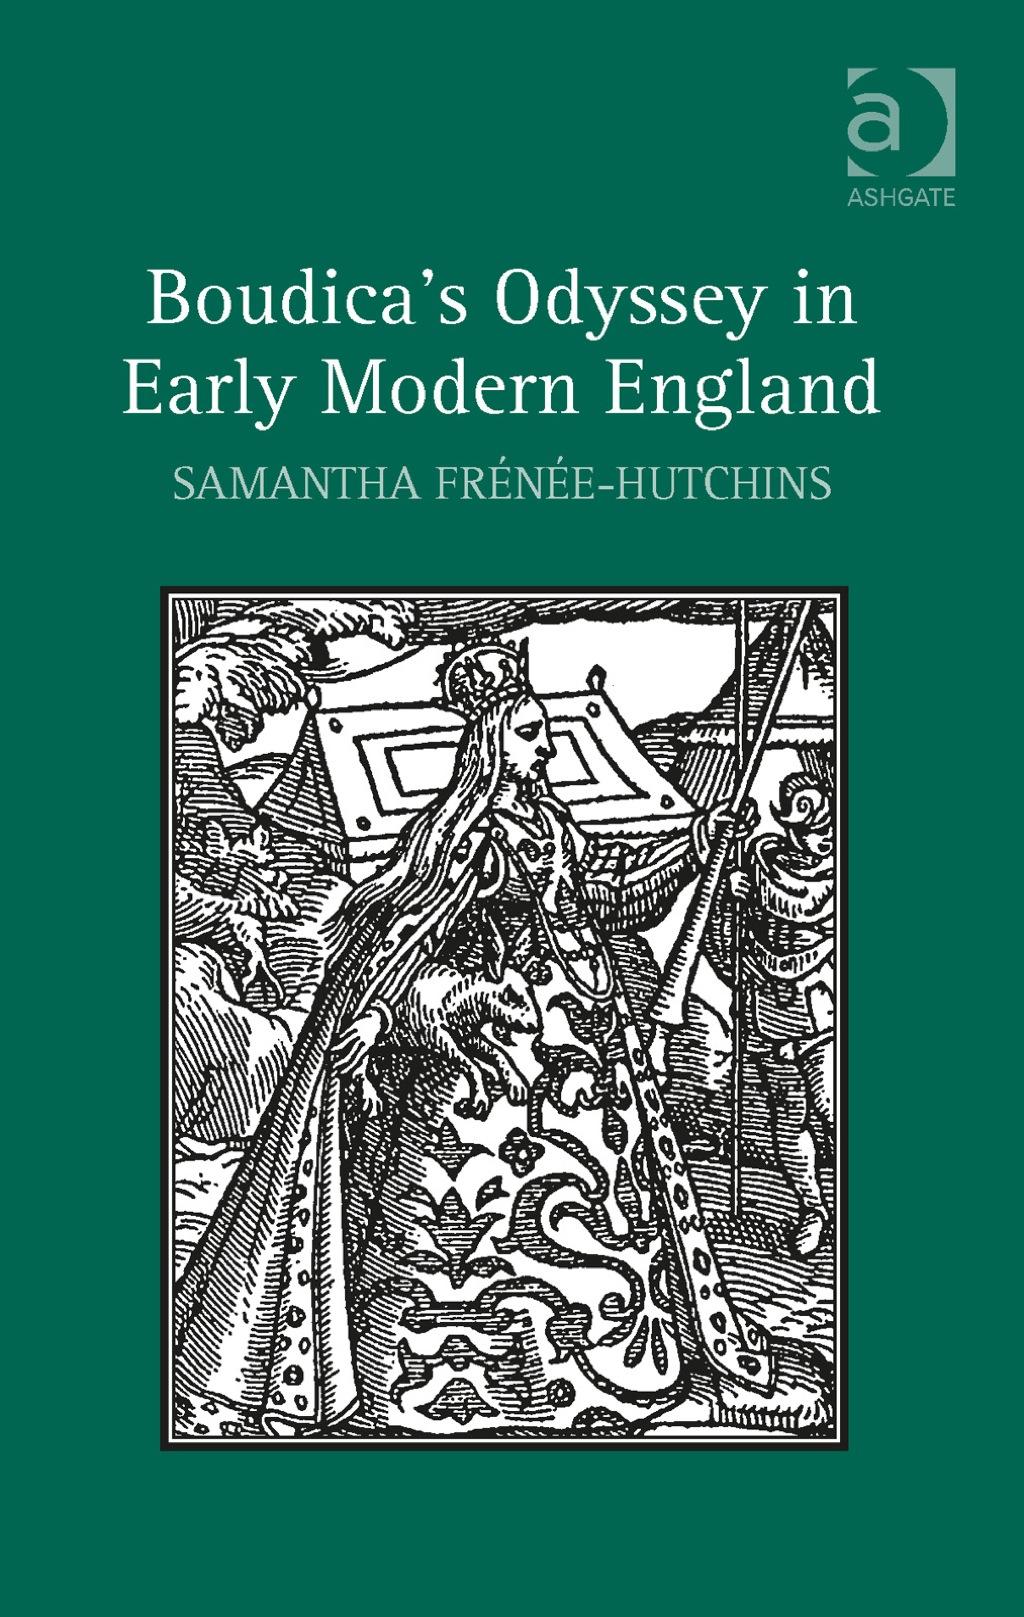 Boudica's Odyssey in Early Modern England (eBook Rental)